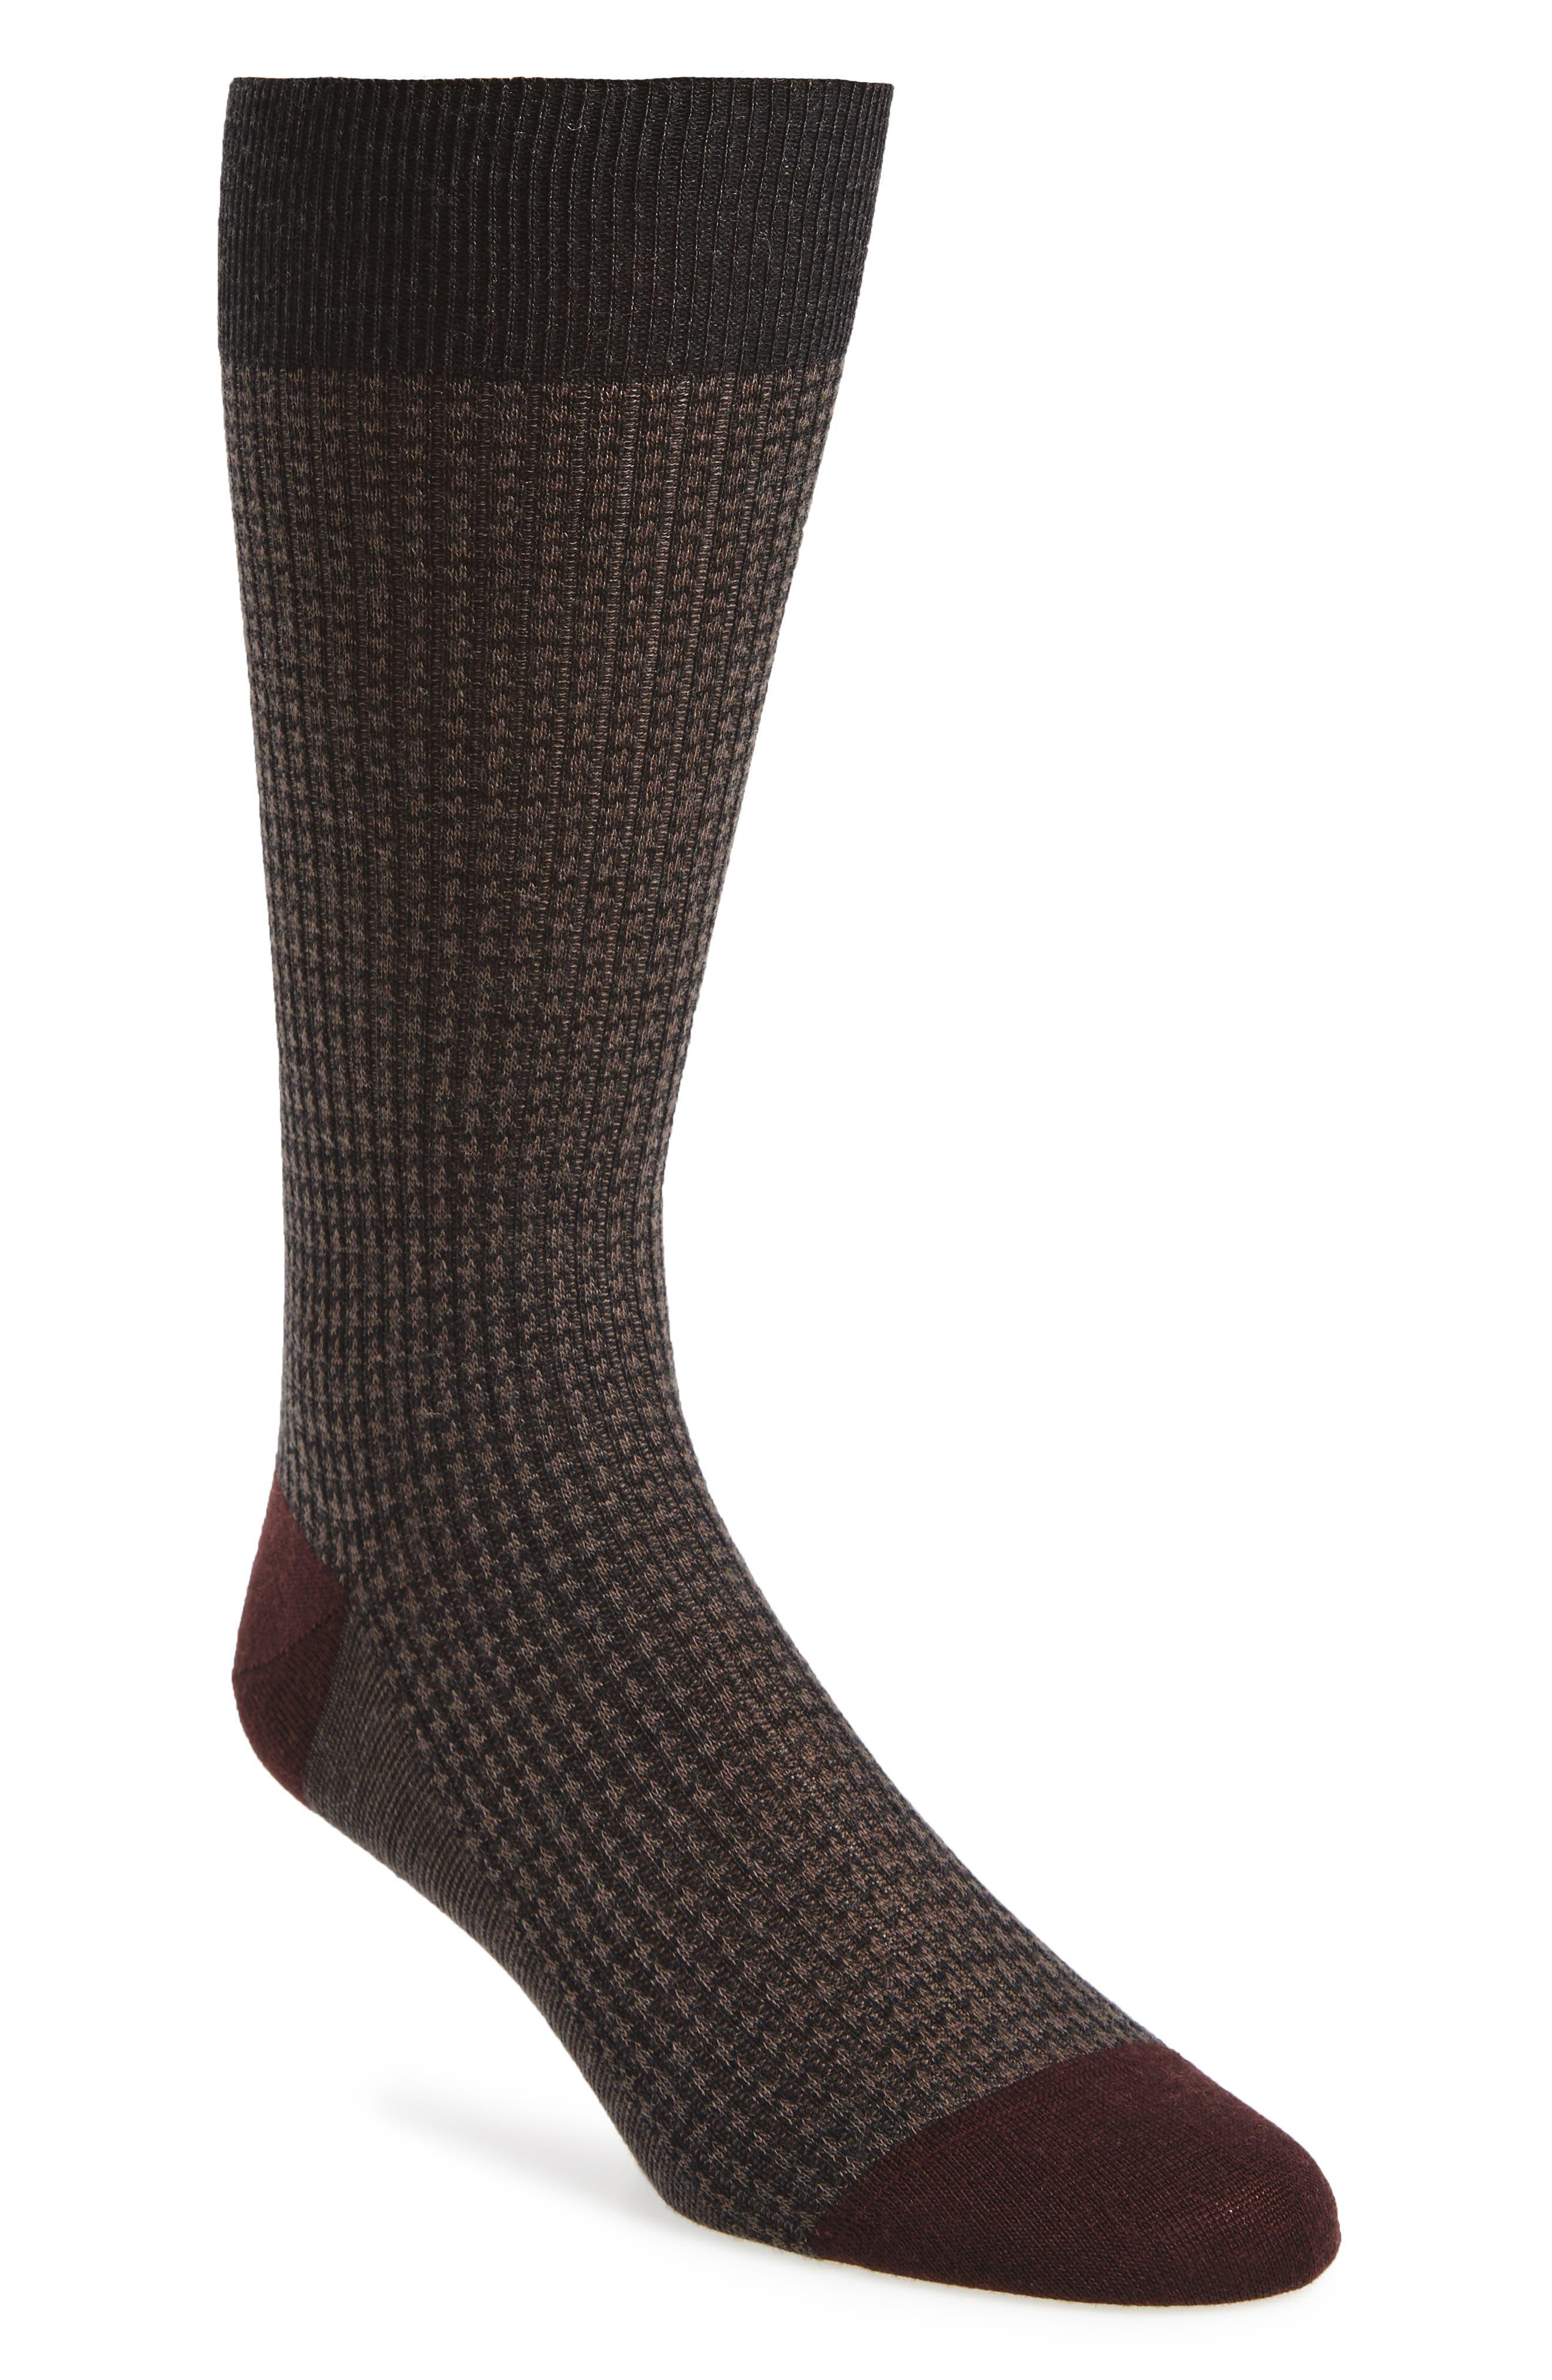 Houndstooth Wool Blend Socks, Main, color, 021